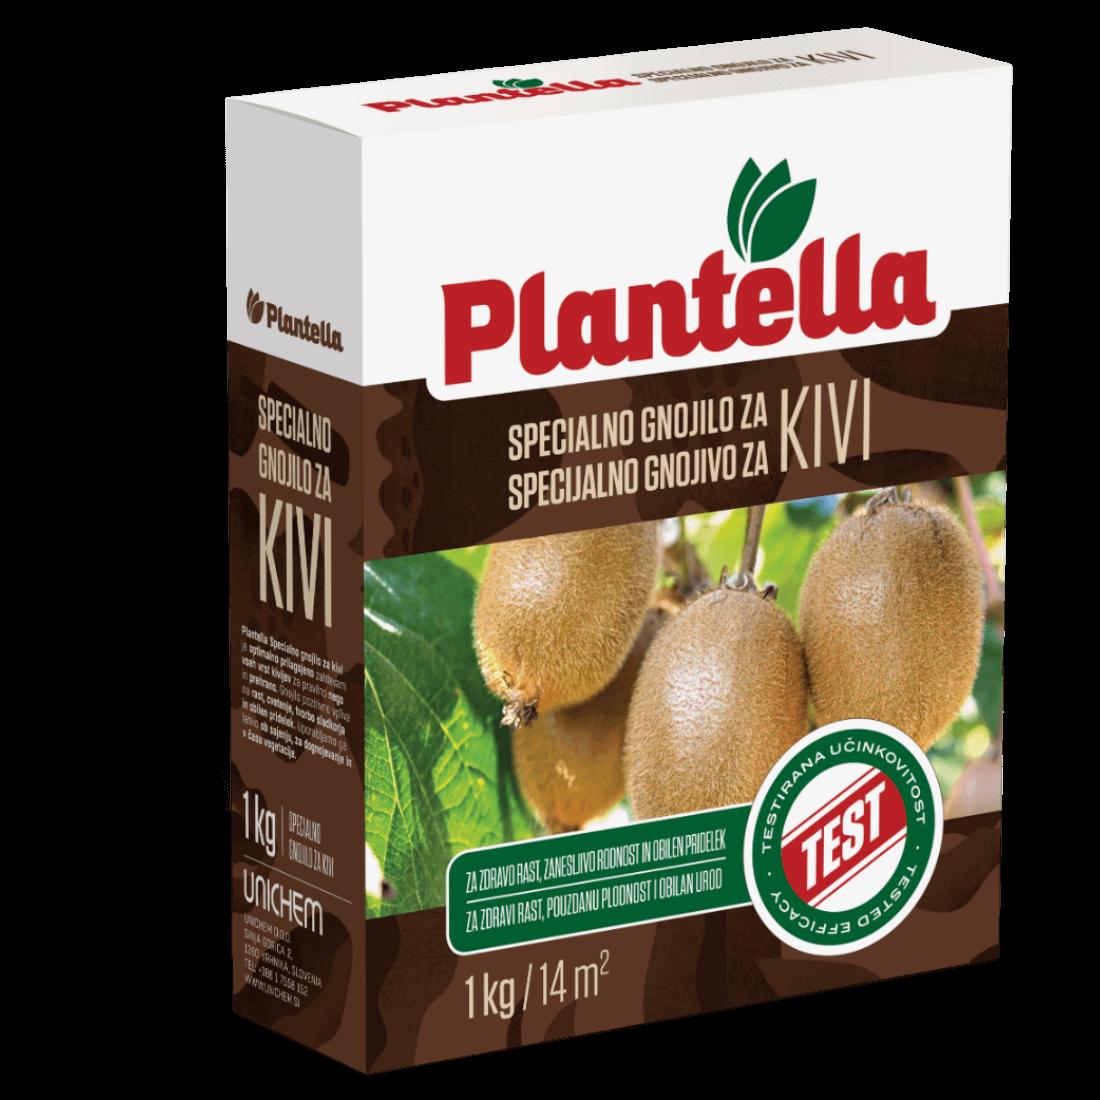 Plantella_Specialno-gnojilo-kivi_1kg_SI-HR